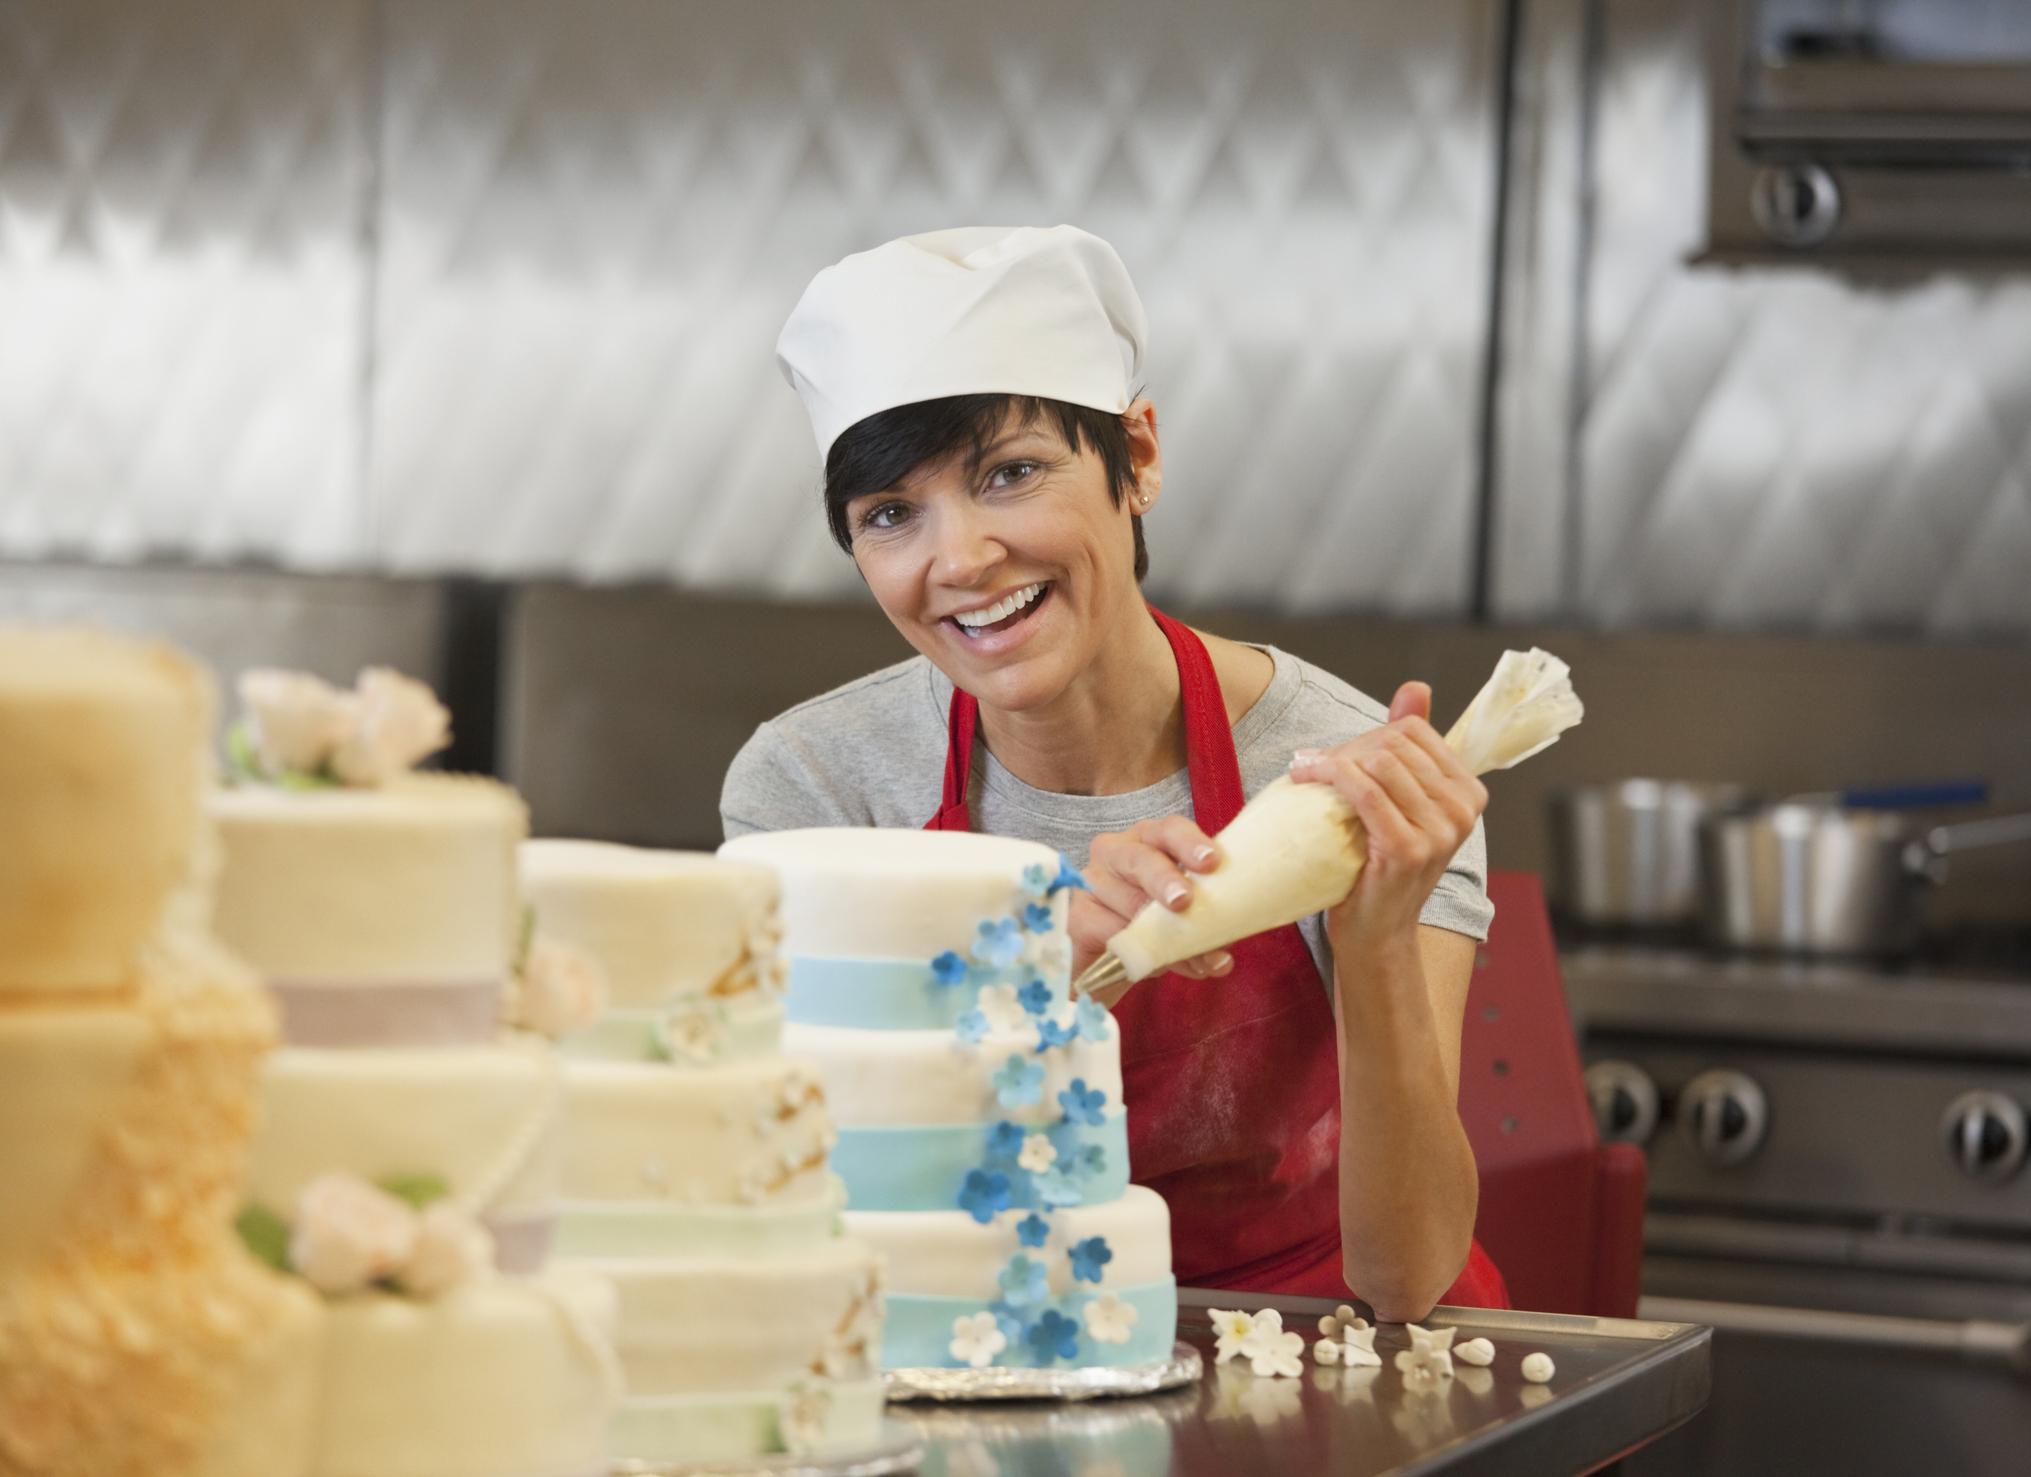 Cake Decorating Resume Tips  LoveToKnow